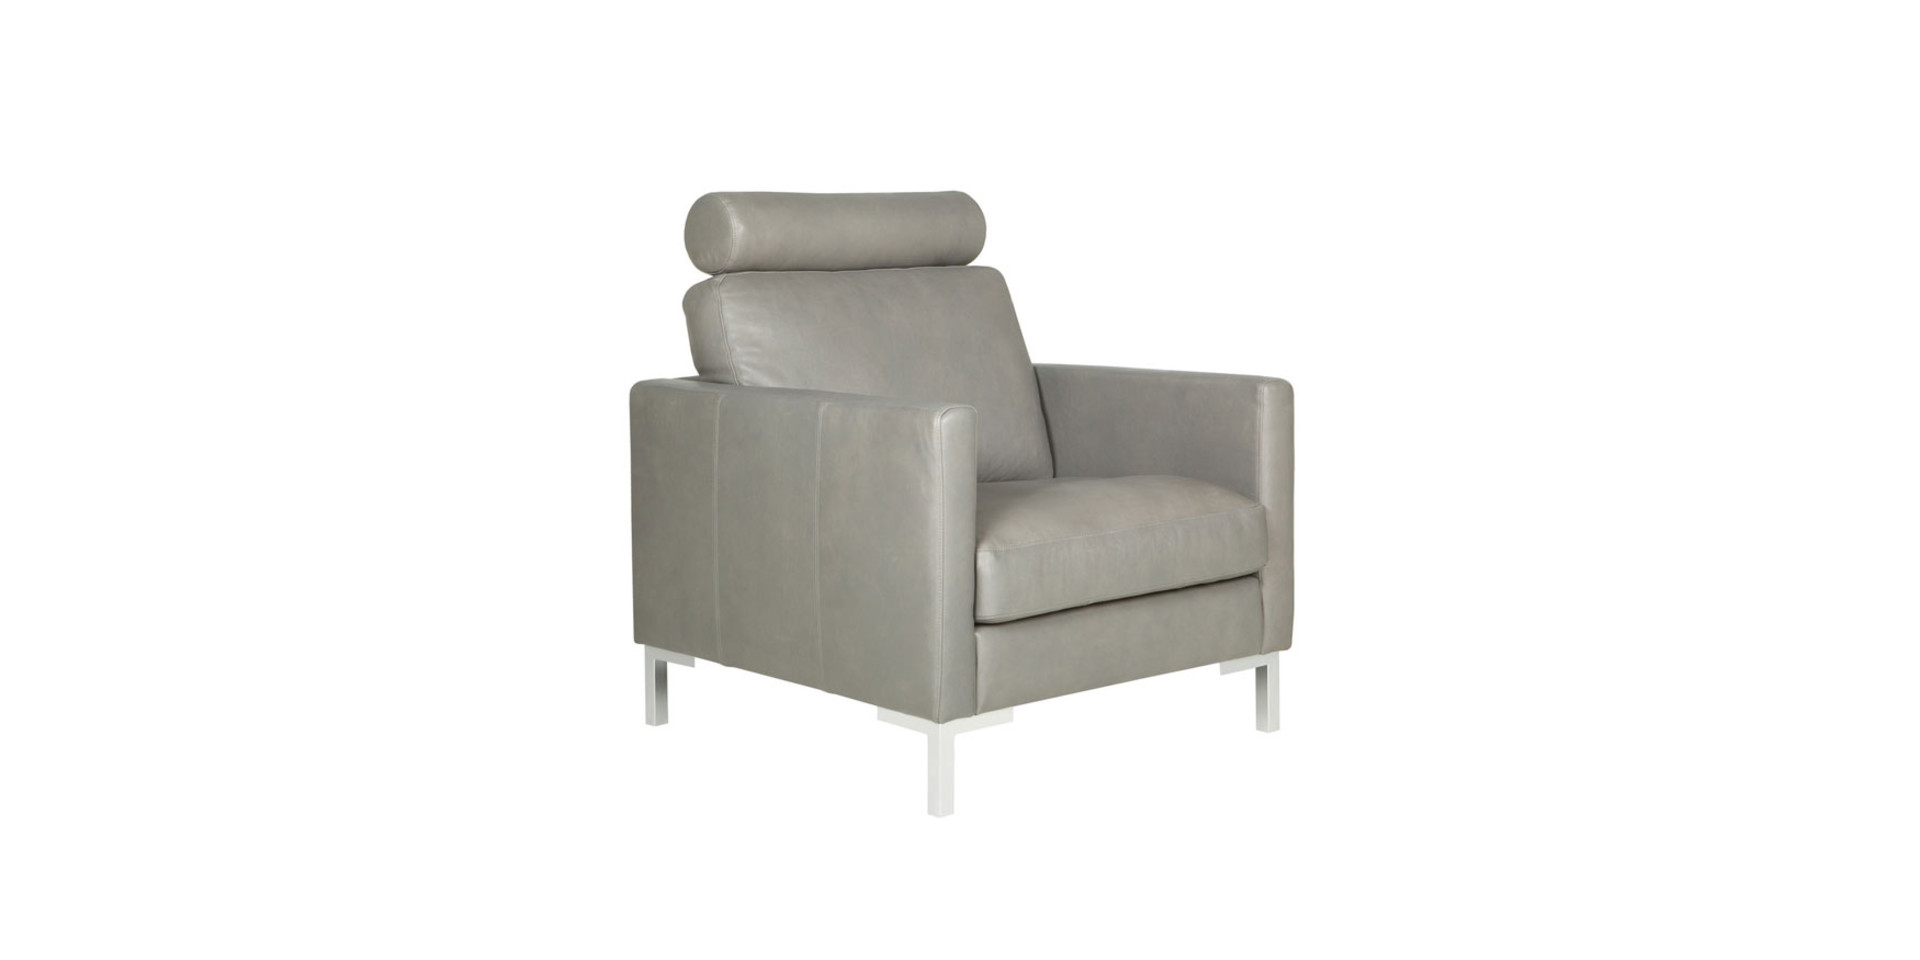 sits-impulse-fauteuil-aniline-black-pieds-145-metal-profil2